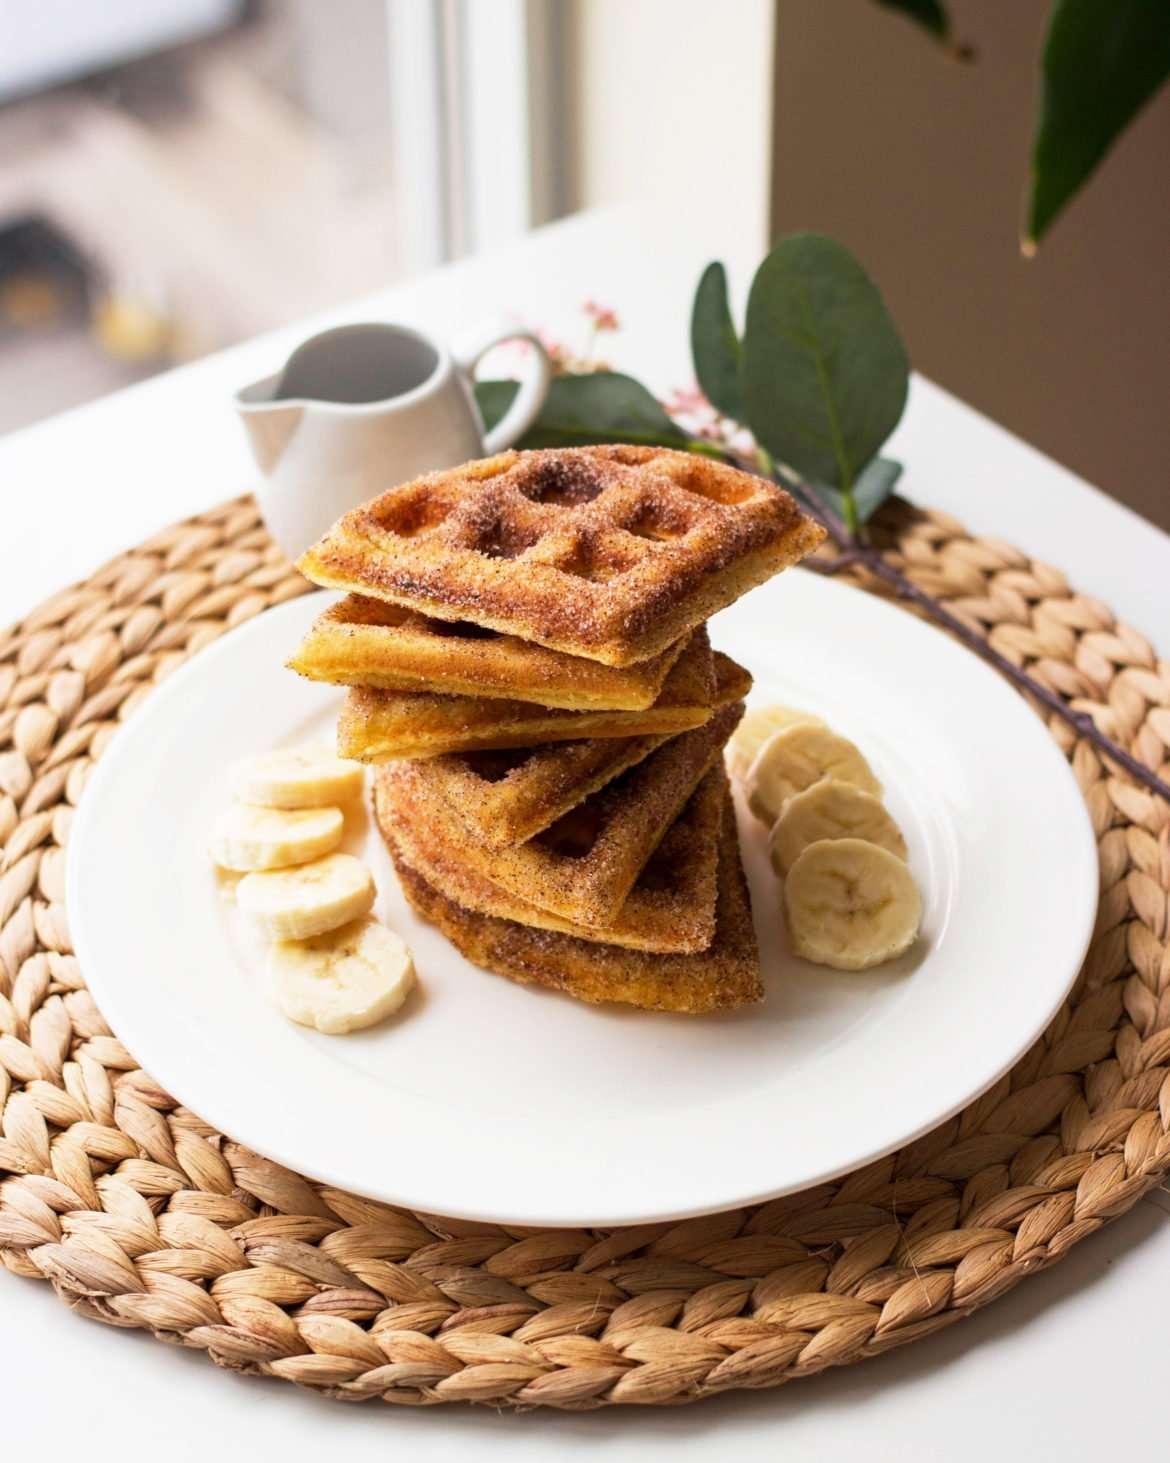 photo of churro waffles dipped in cinnamon sugar